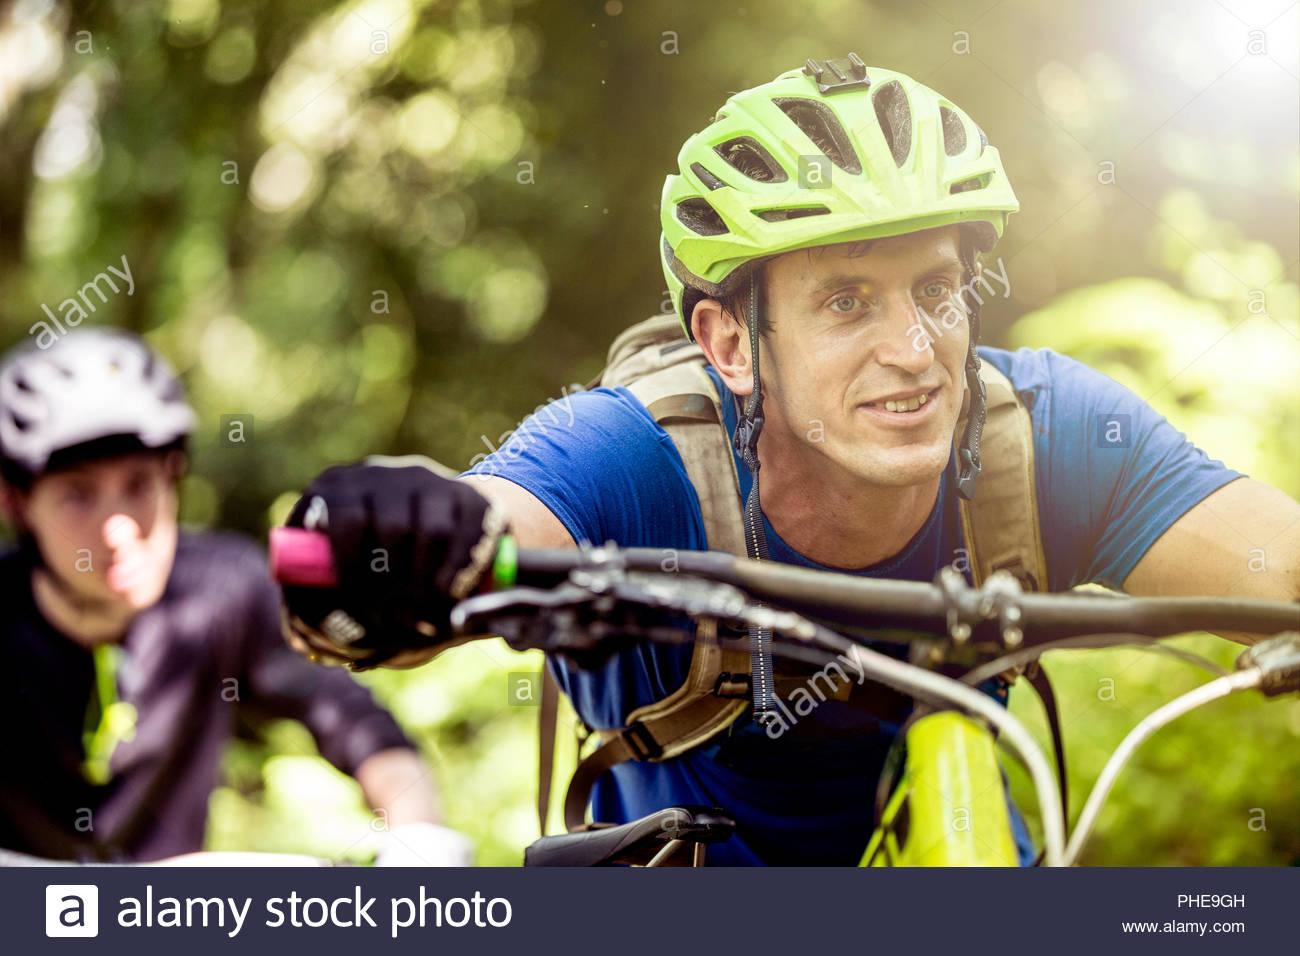 Mann drücken Mountainbike im Wald Stockbild